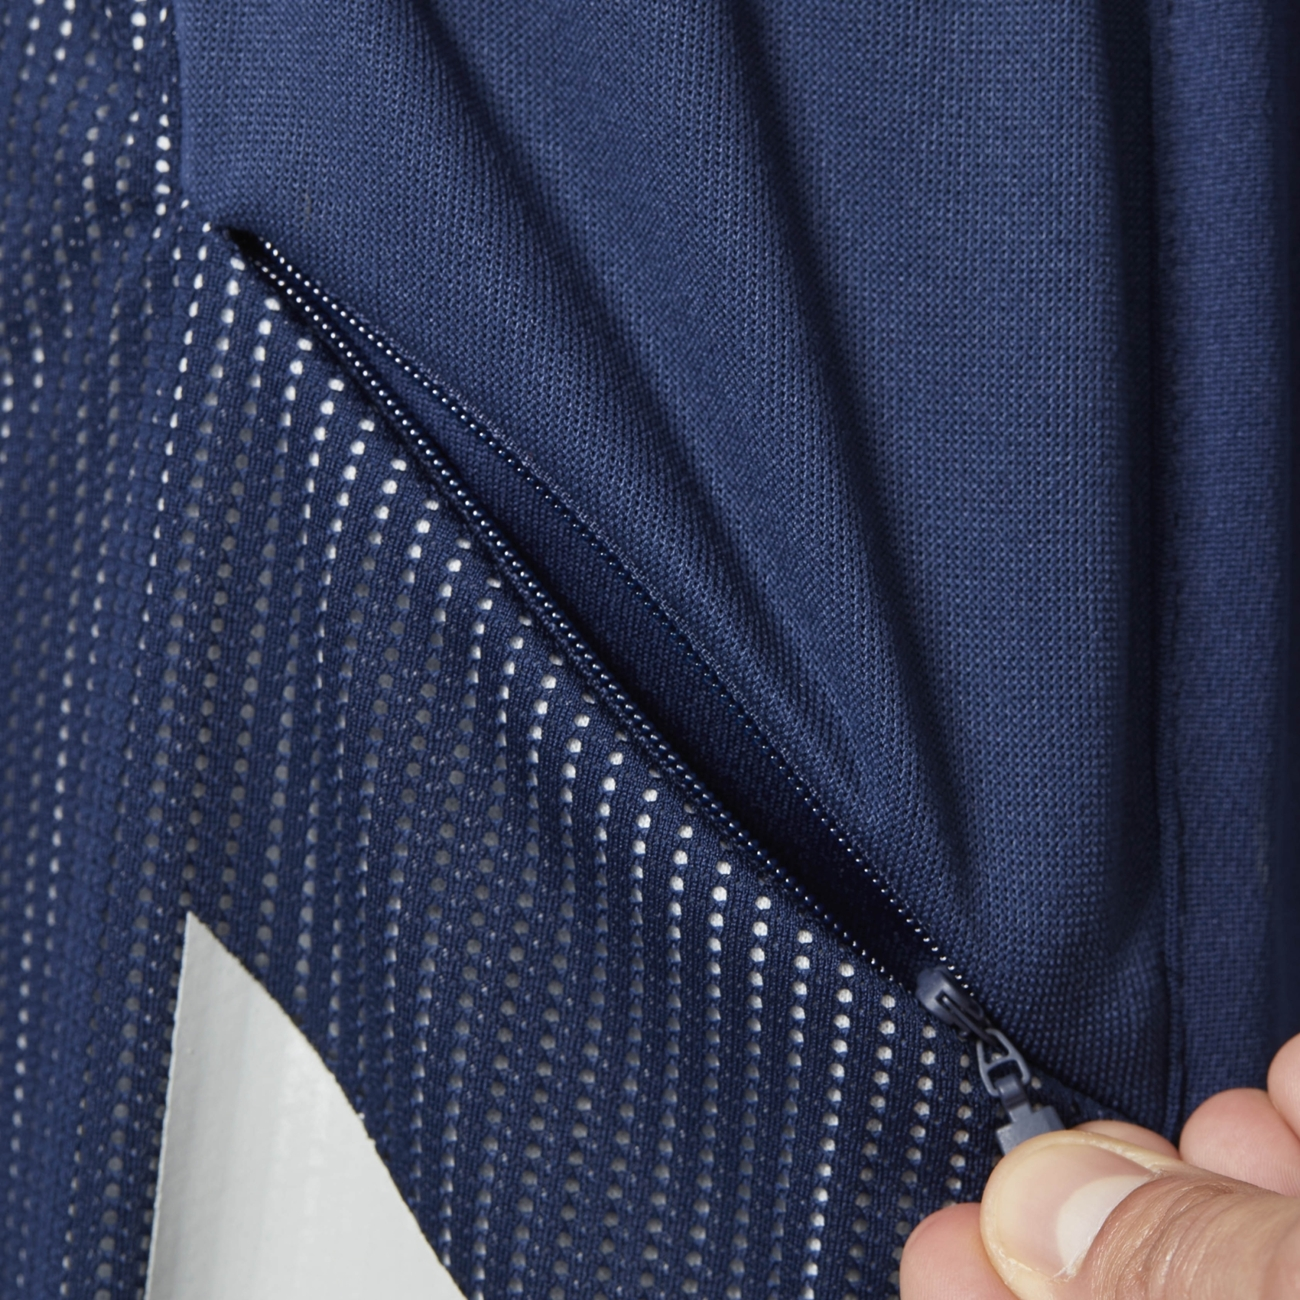 Adidas Harden BTE Short Commercial (Collegiate Navy)